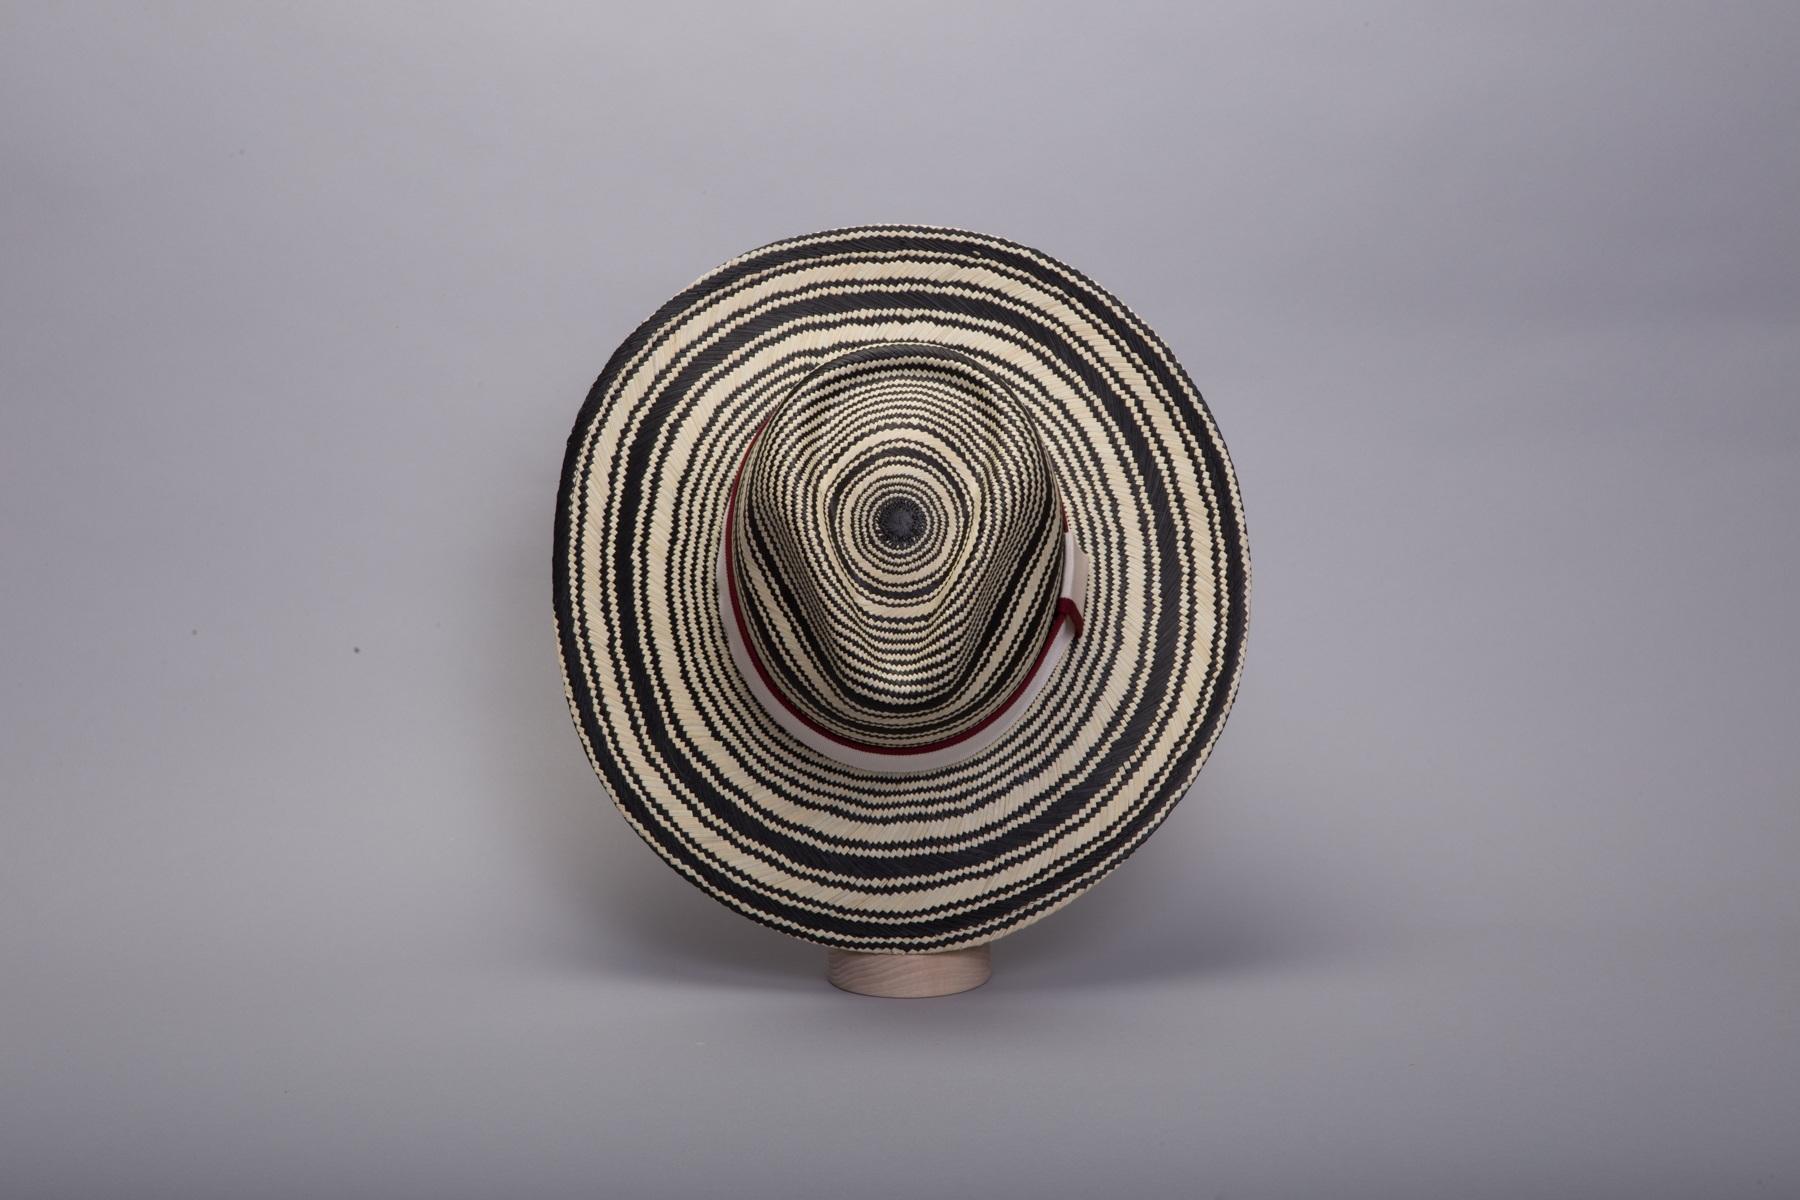 chapeau-panama-saintremy-gif1-1800x1200